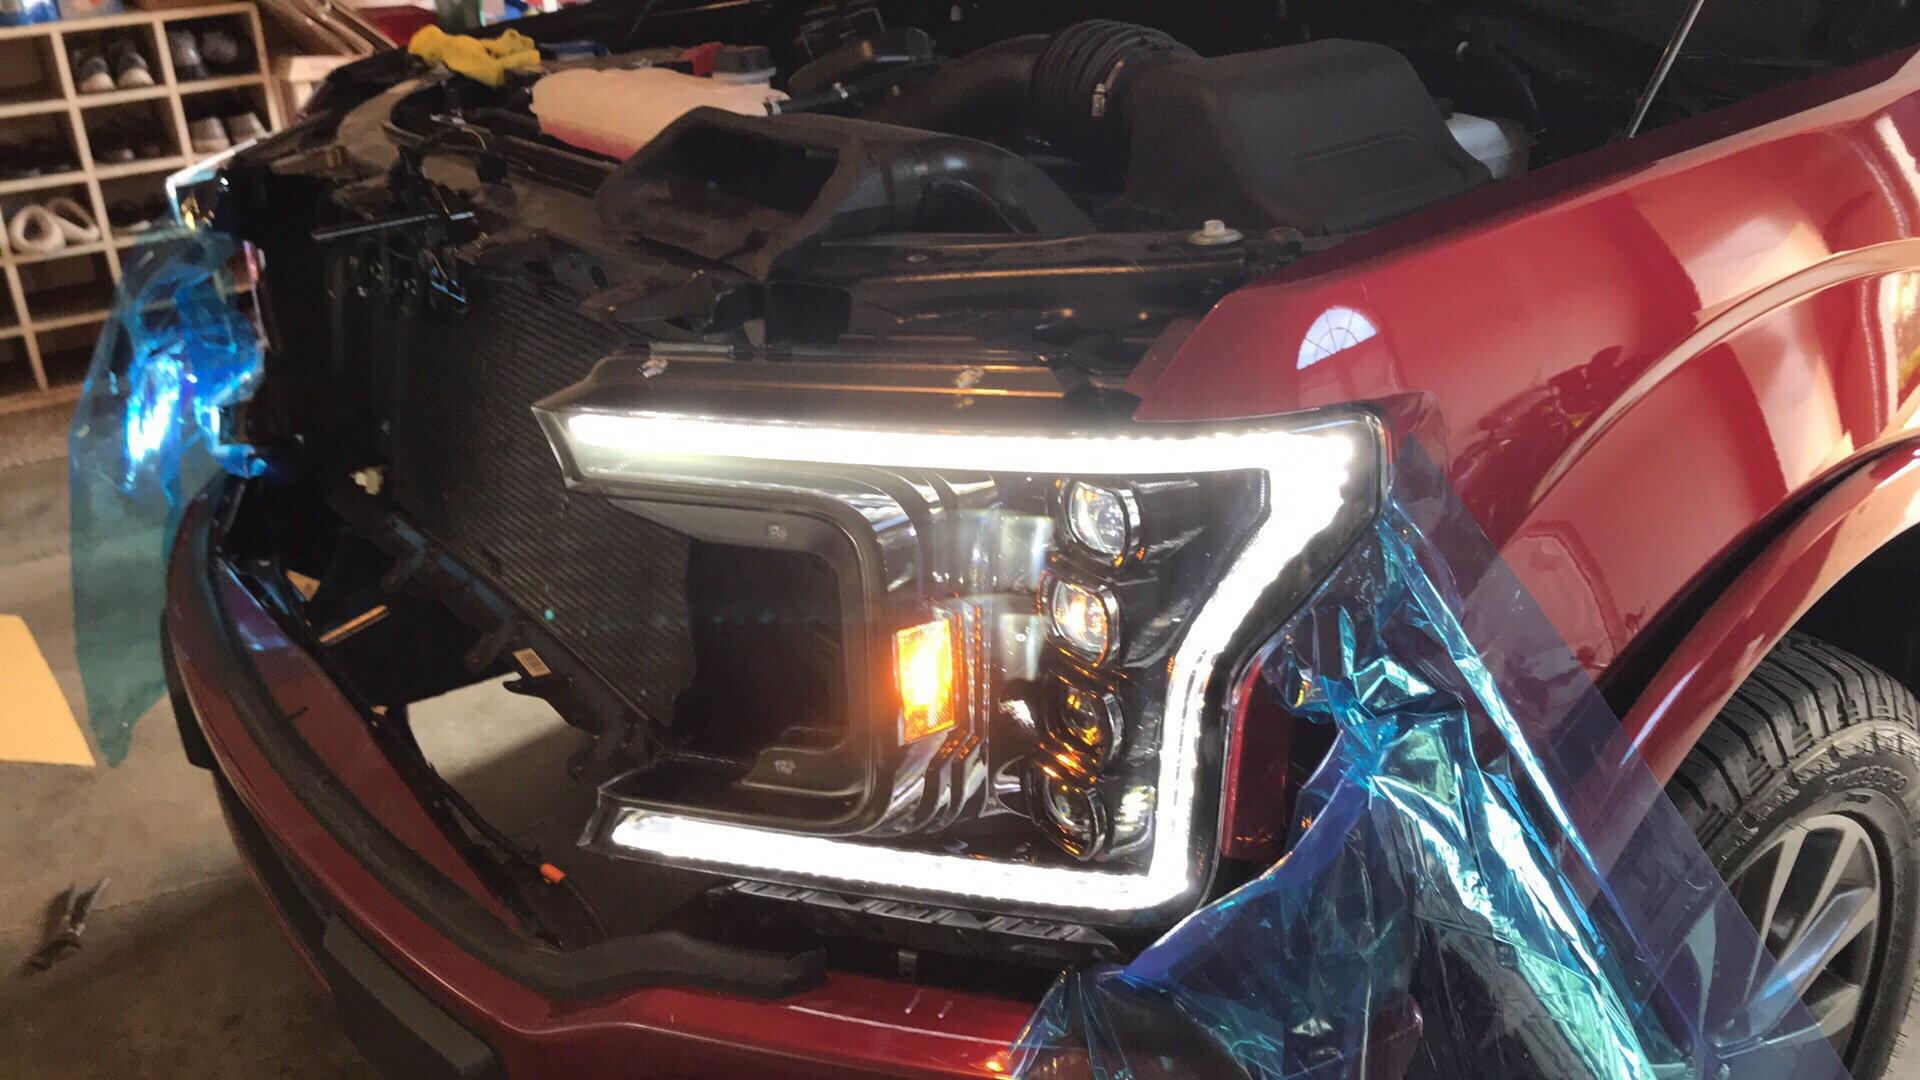 2018+ Morimoto XB LED headlights & fog lights installed